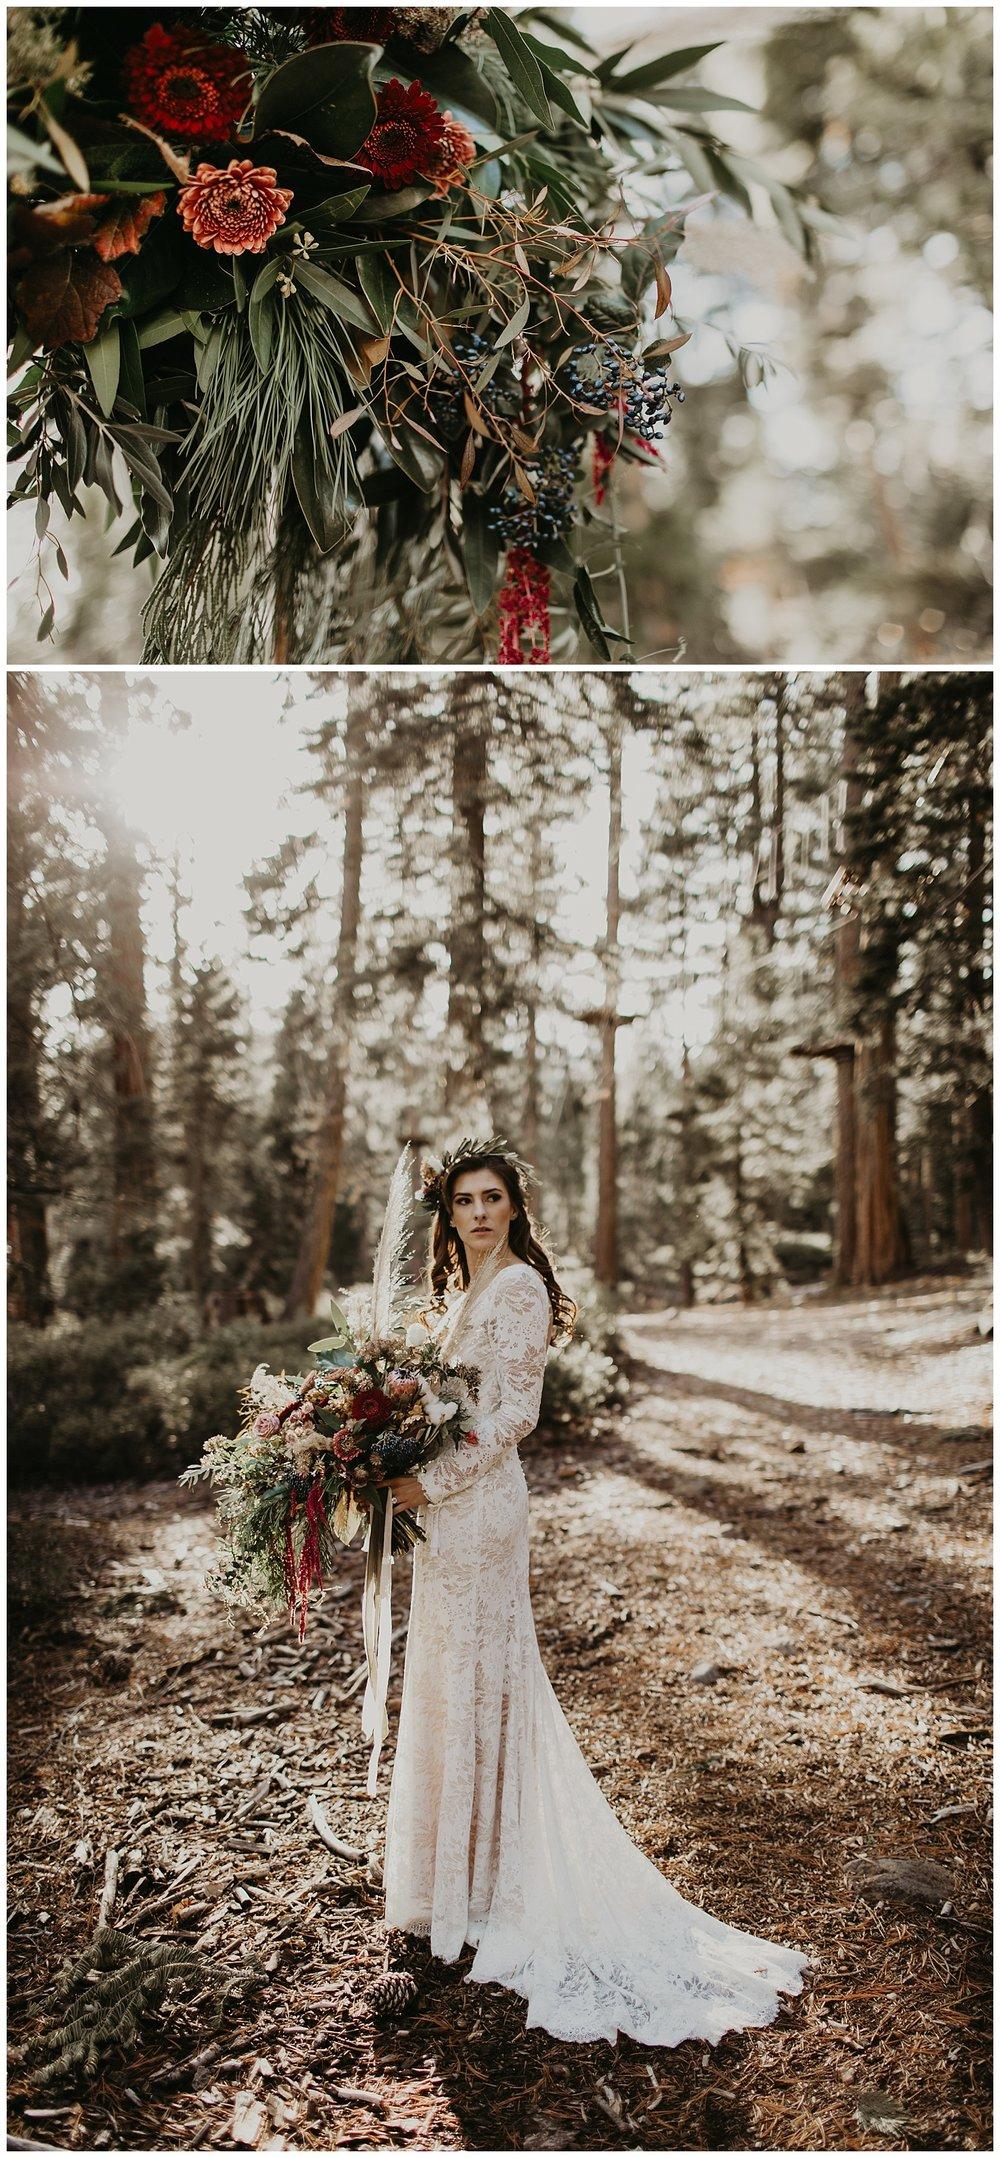 lake-tahoe-winter-wedding-boho-bride-dress-outdoor-wedding.jpg